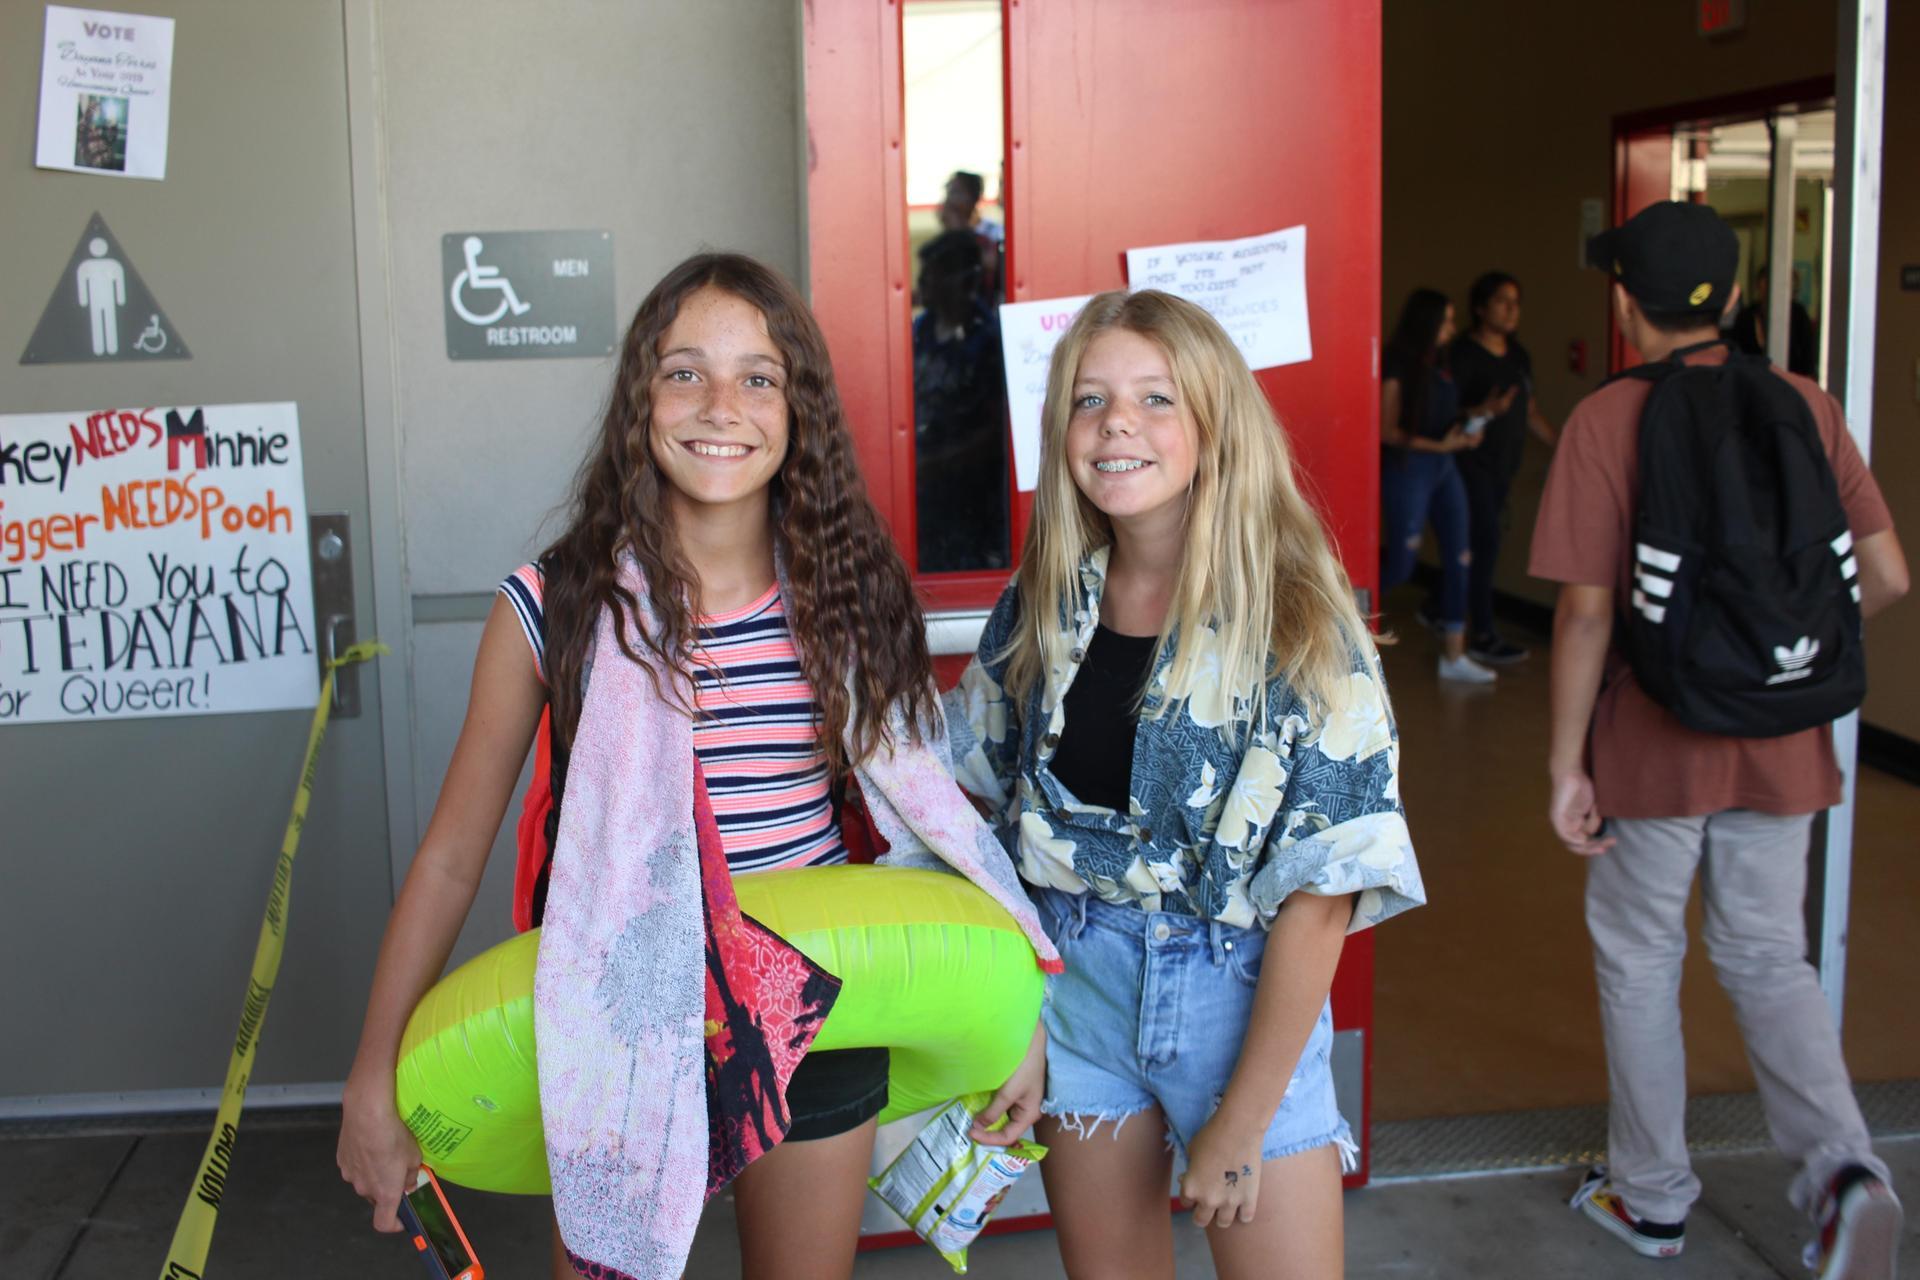 Enjoying life at Chowchilla High School events